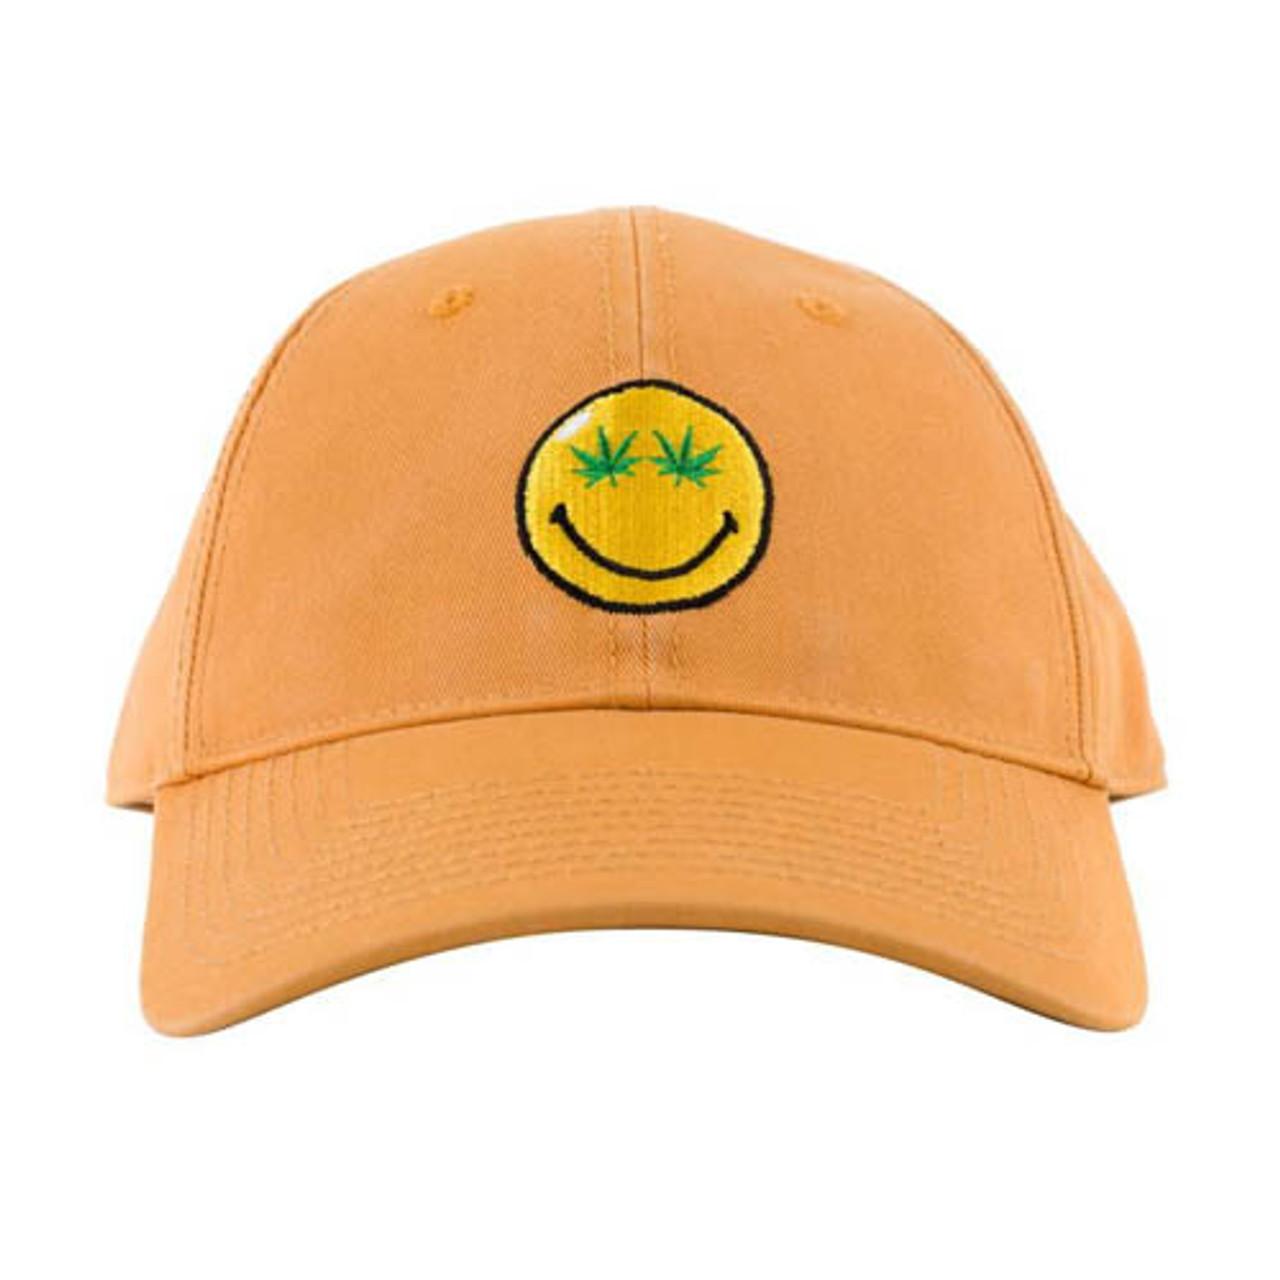 No Bad Ideas - Dad Hat - Mr Nice Guy (Orange/Yellow)